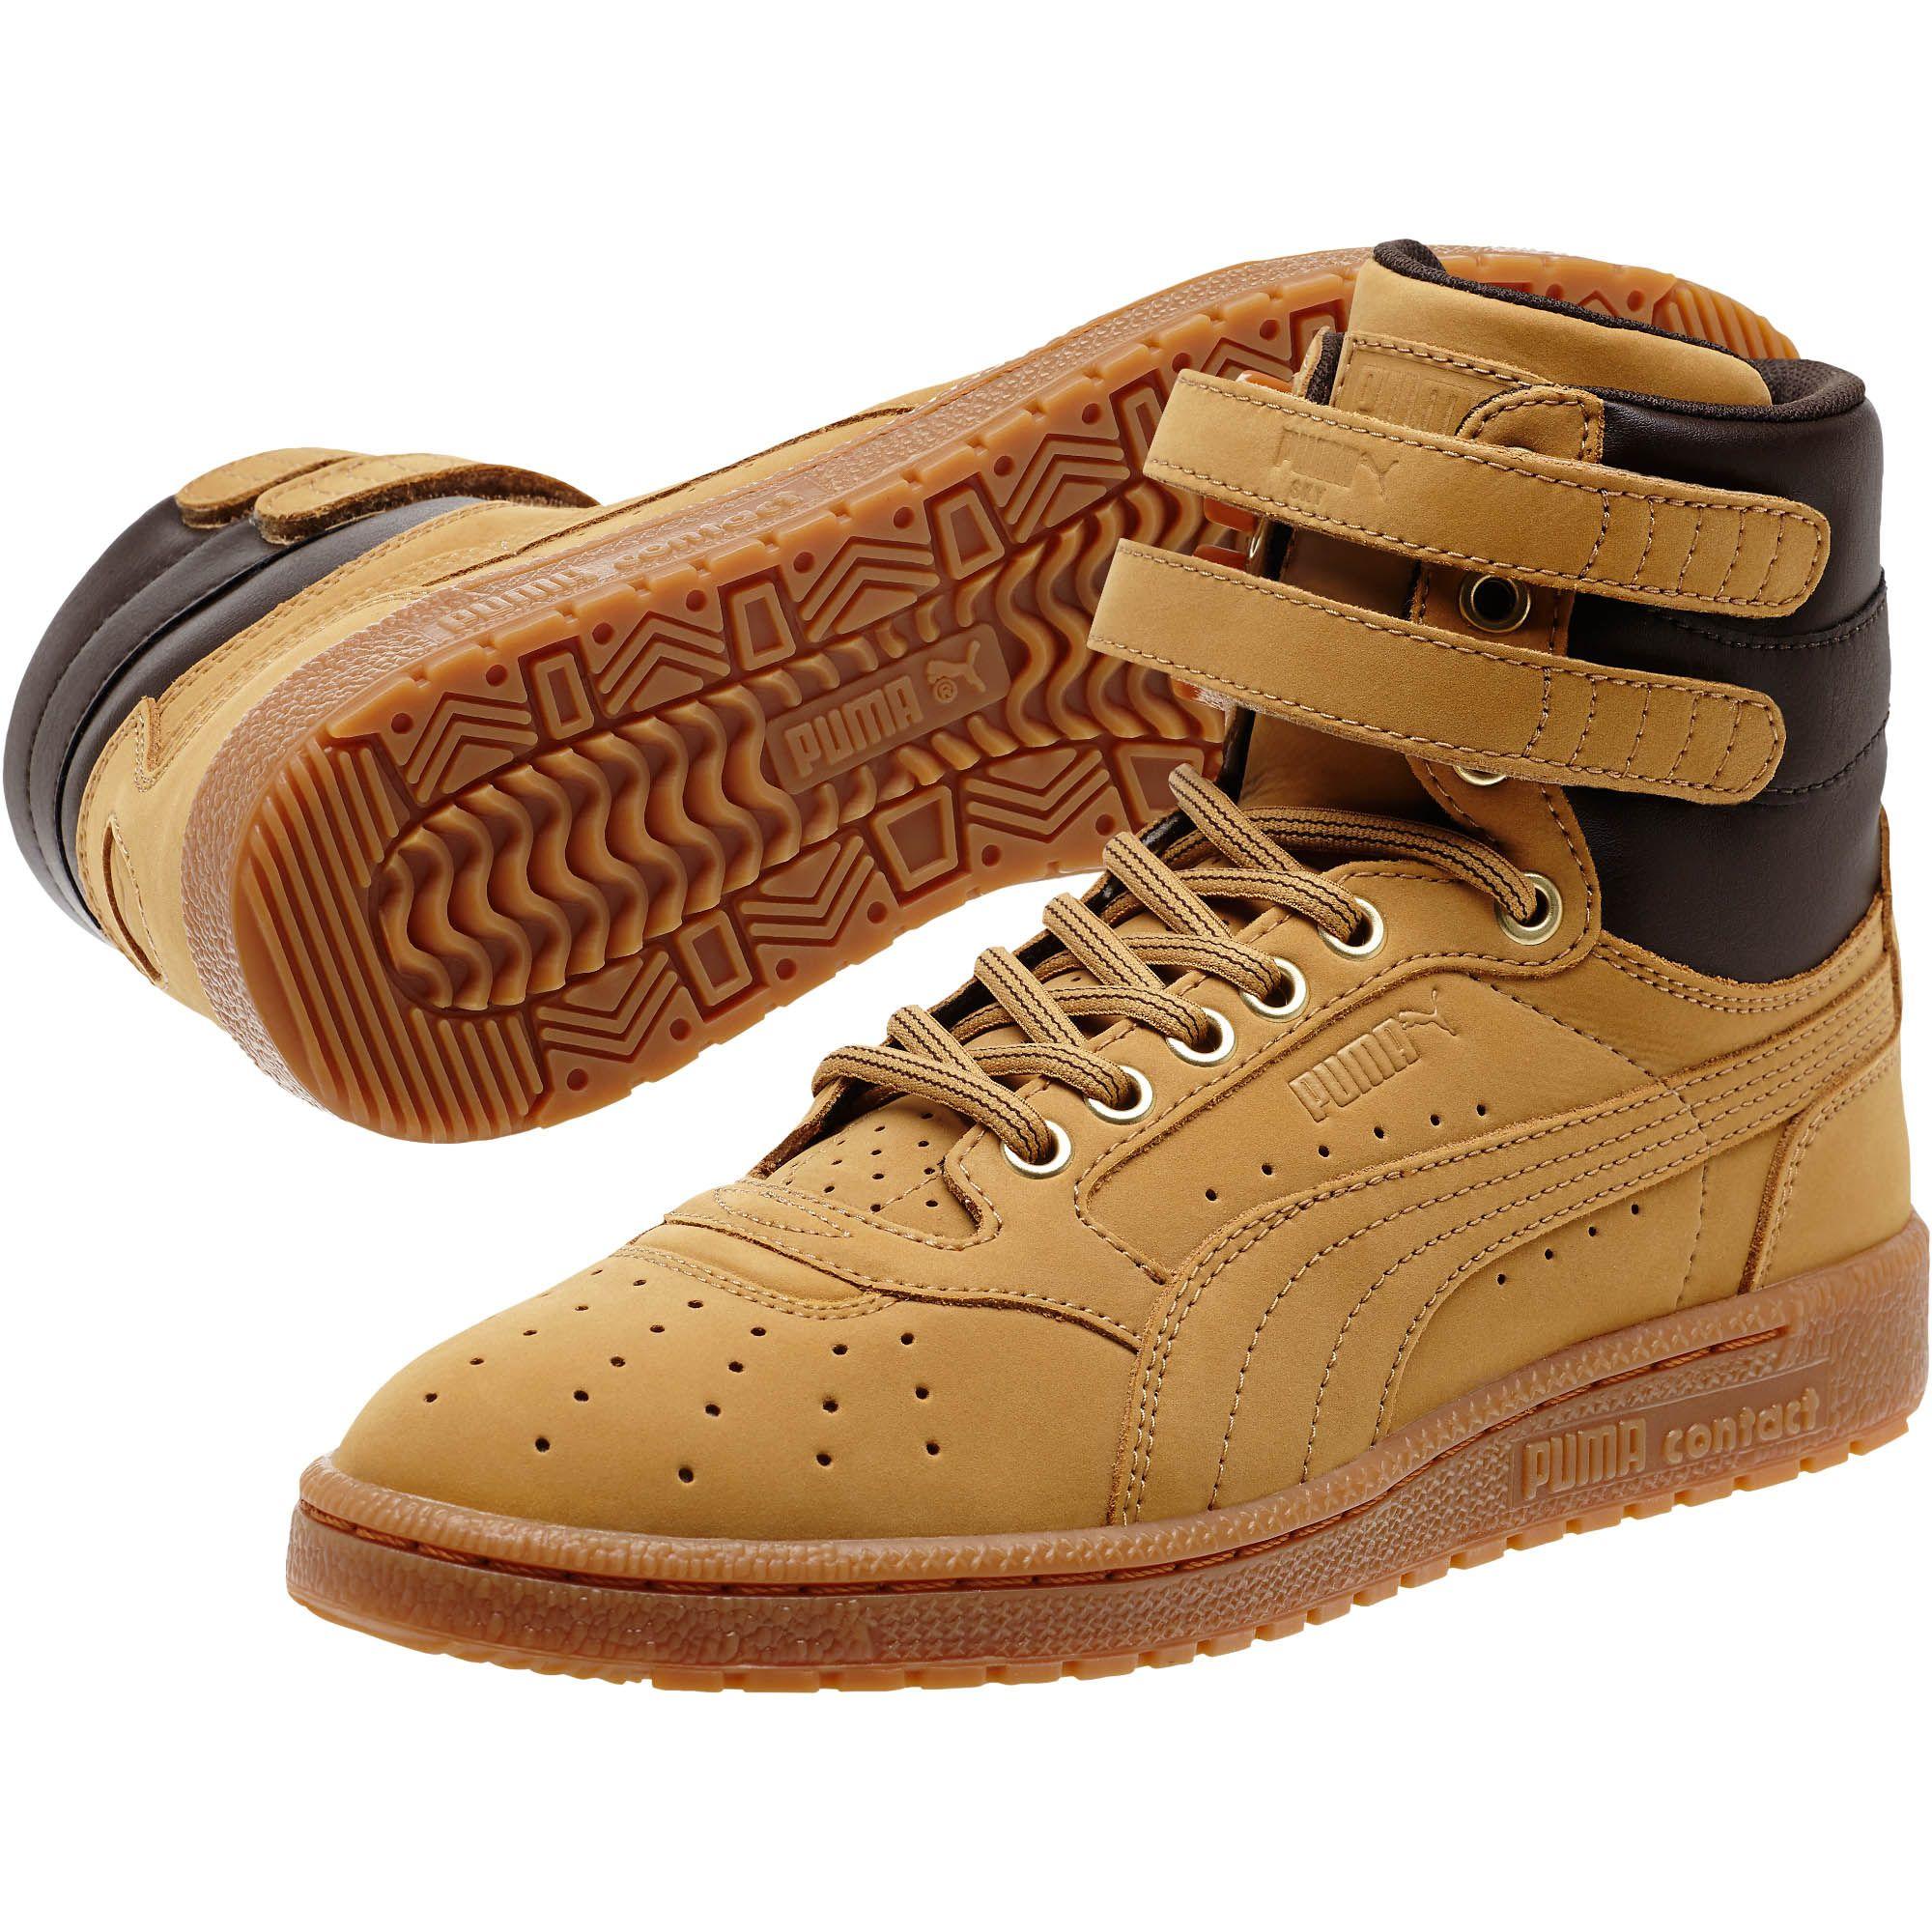 984d204c97d3 Lyst - PUMA Sky Ii Hi Nubuck Men s Sneakers in Brown for Men